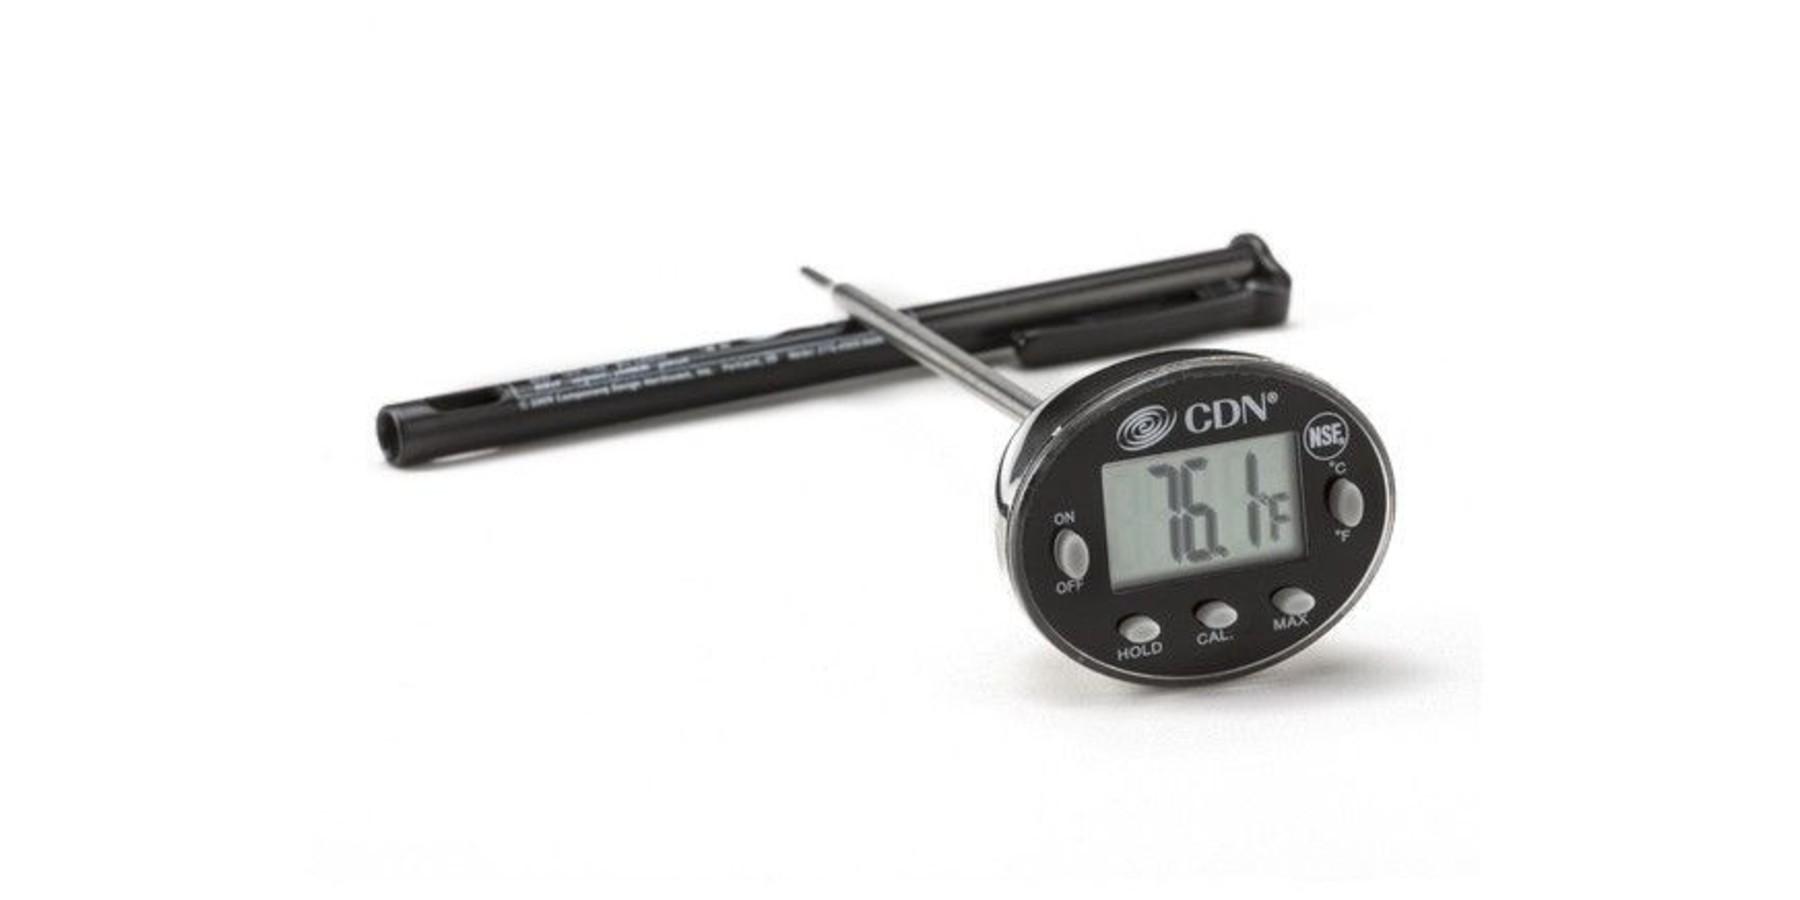 Pro-accurate digitale thermometer